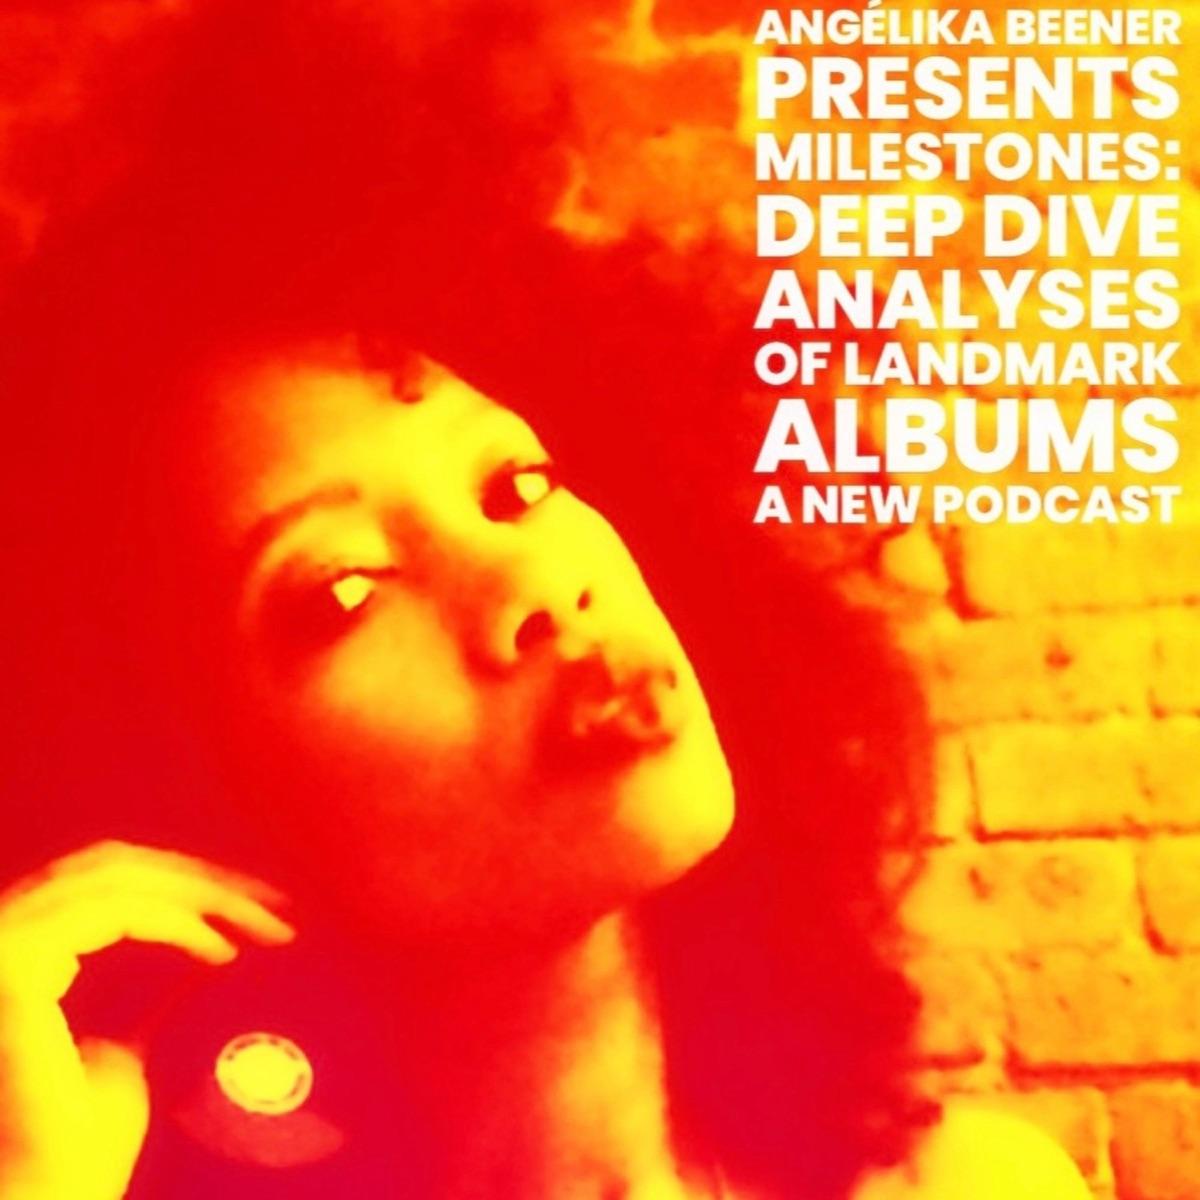 Milestones: Deep Dive Analyses of Landmark Albums with Angélika Beener